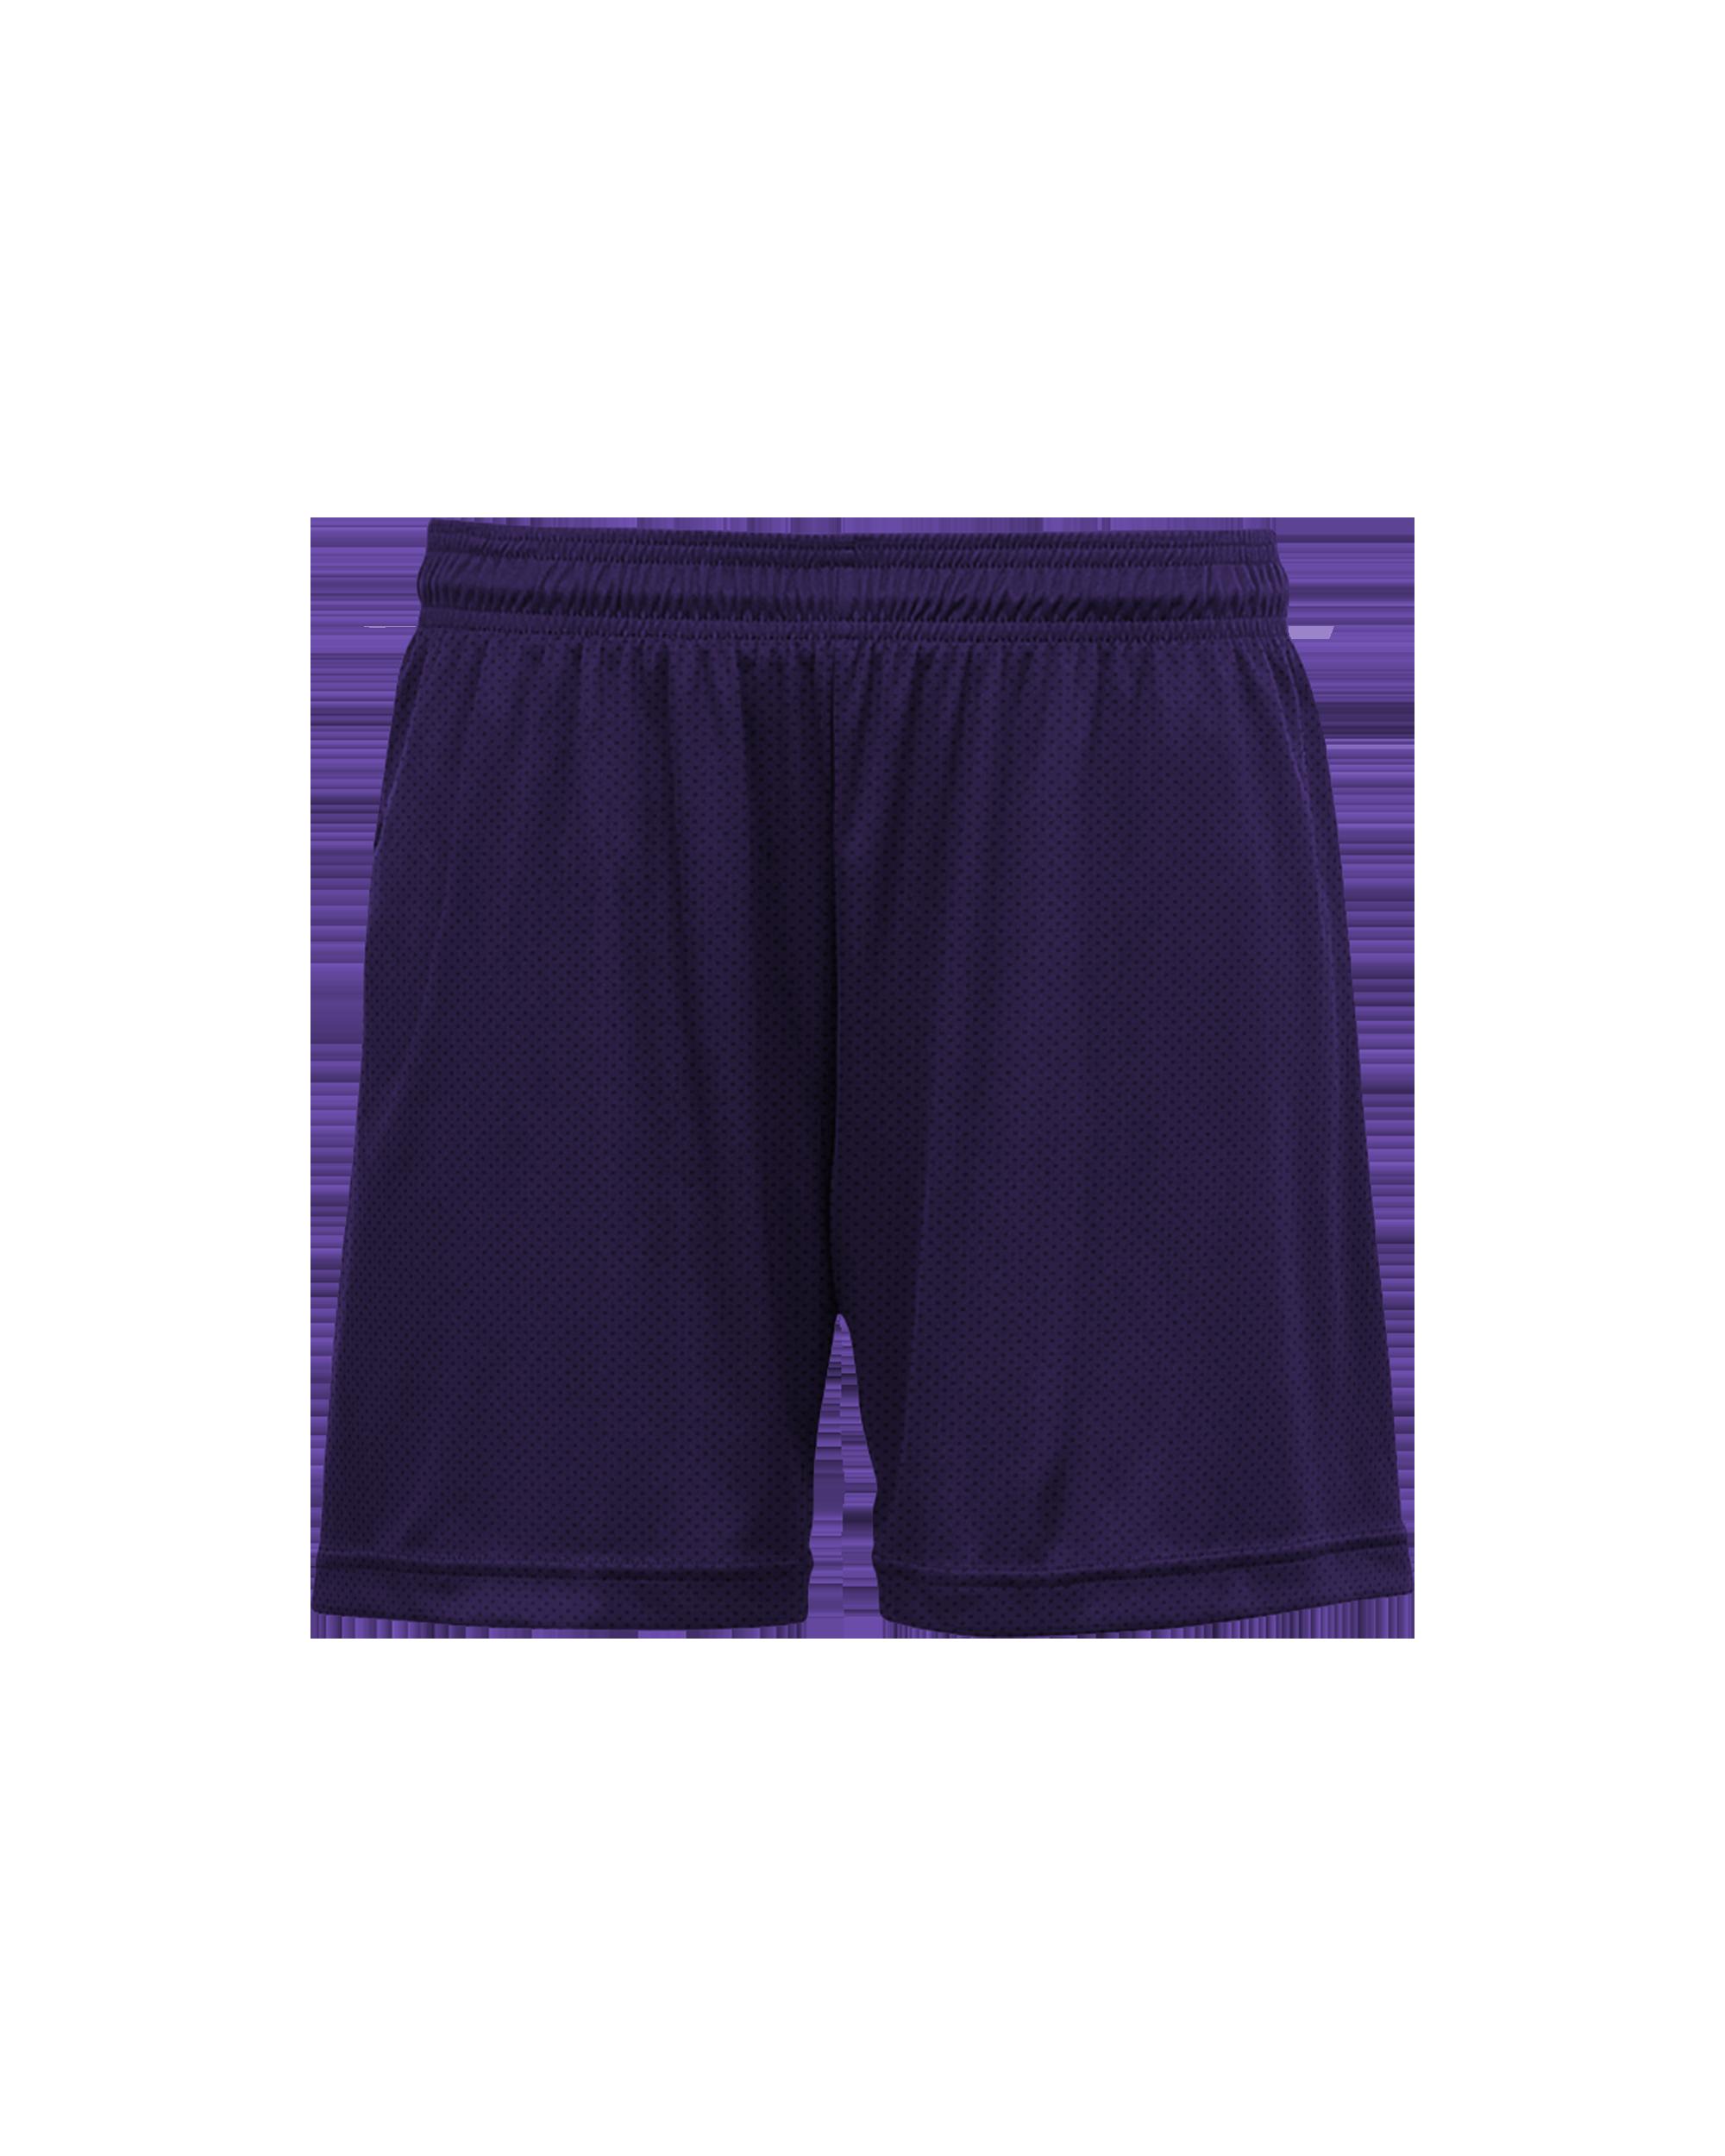 Mesh Women's Short - Purple